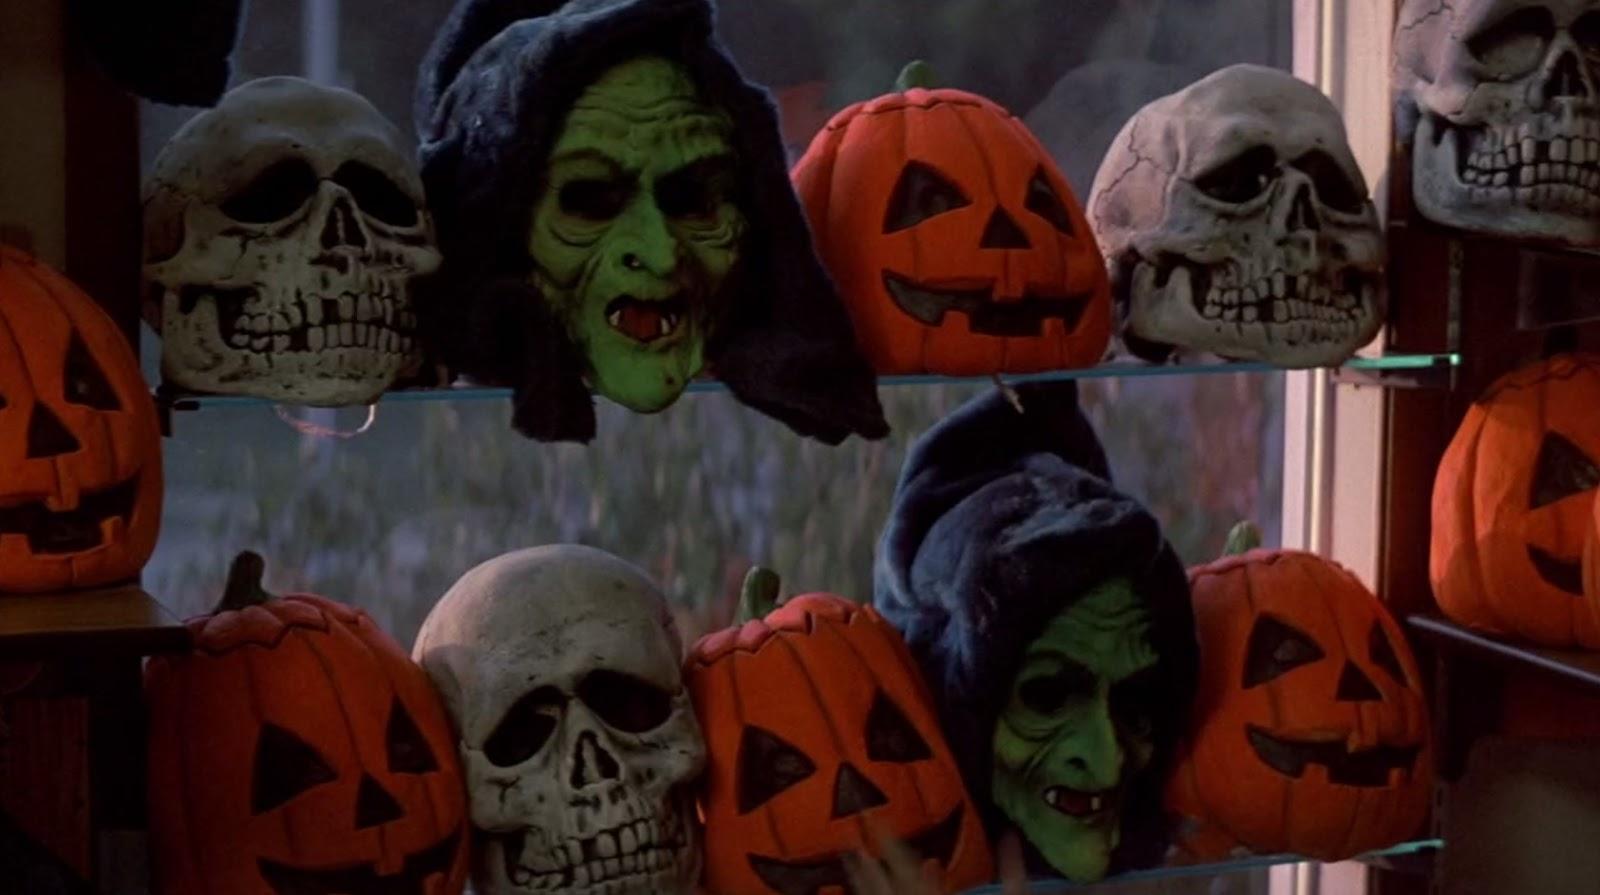 OTIS (Odd Things I've Seen): Halloween III: Season of Our Discontent